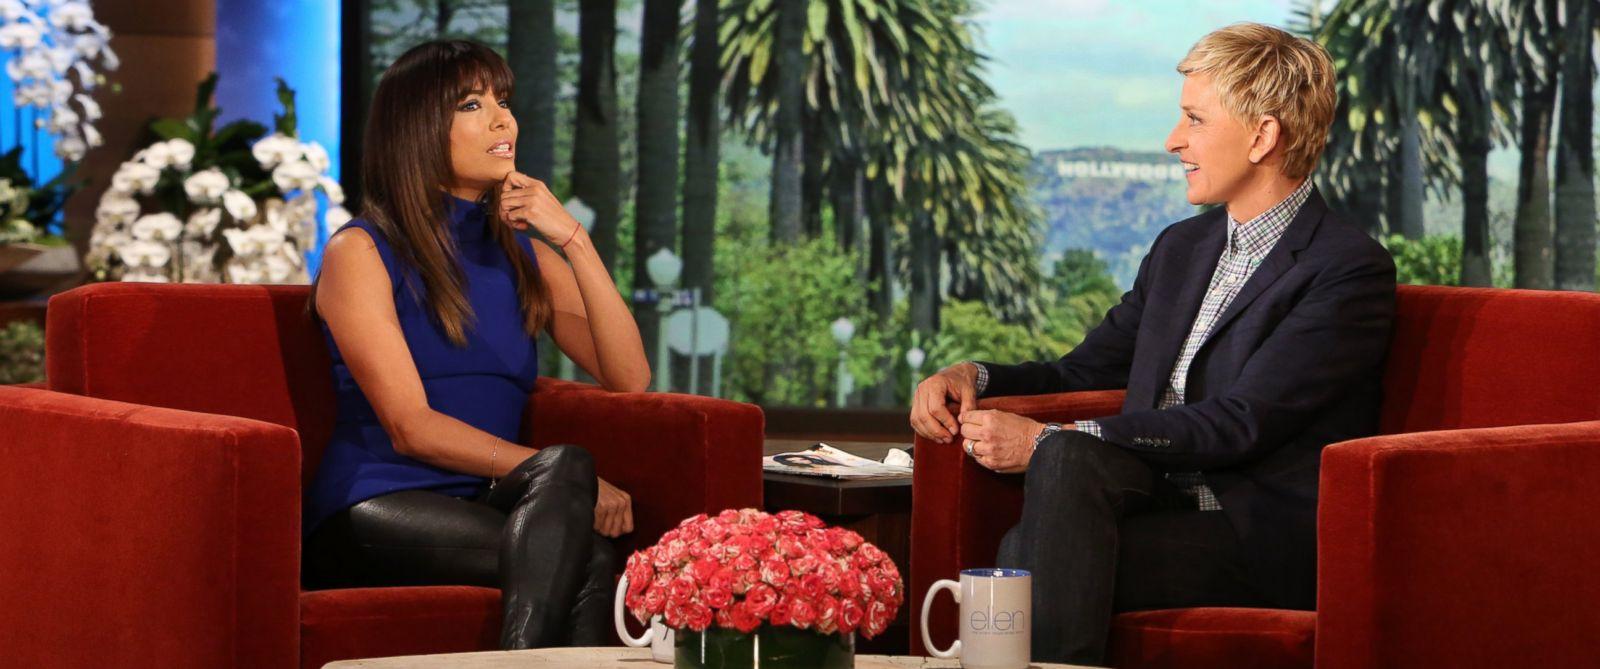 "PHOTO: Actress Eva Longoria makes an appearance on ""The Ellen DeGeneres Show"" on April 14, 2014."